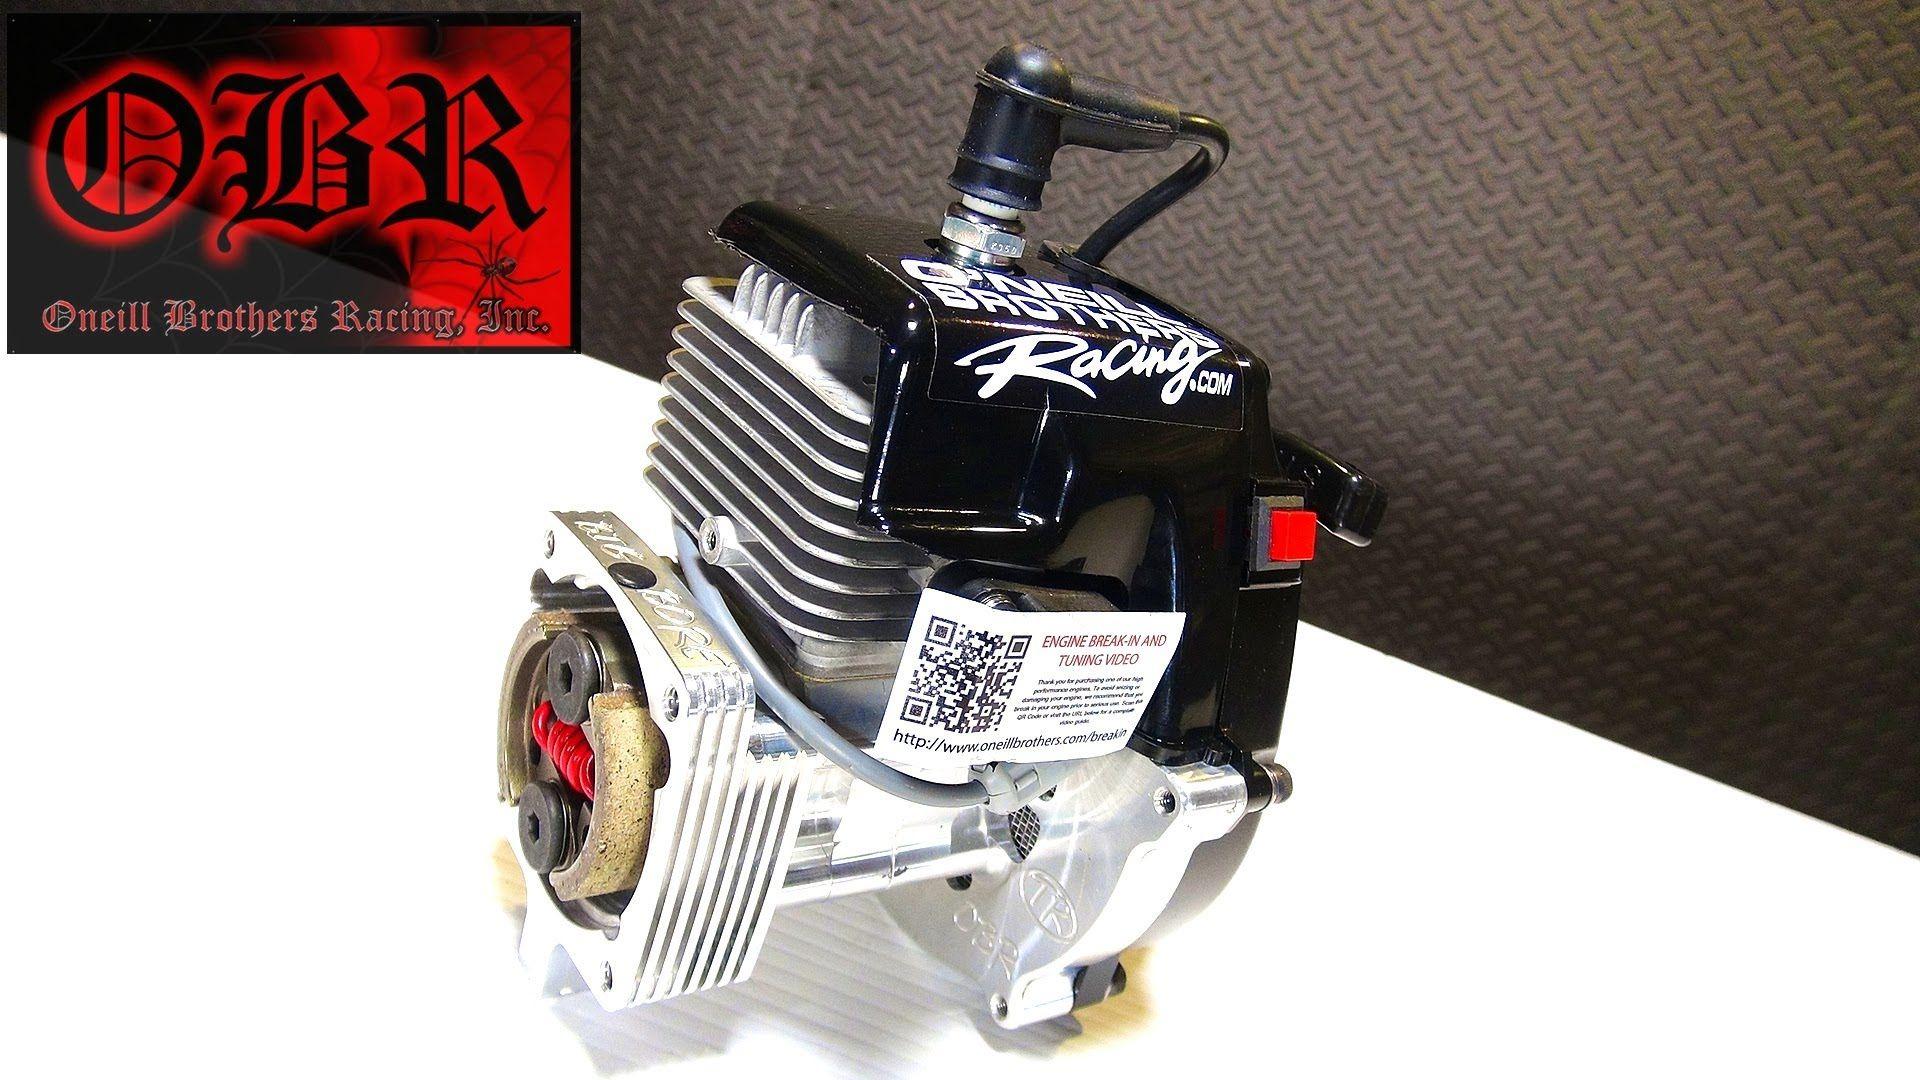 Rc Adventures Obr 97hp Full Mod 38cc Widowmaker Gas Engine Mesh Wiring Kill Switch With Alternator